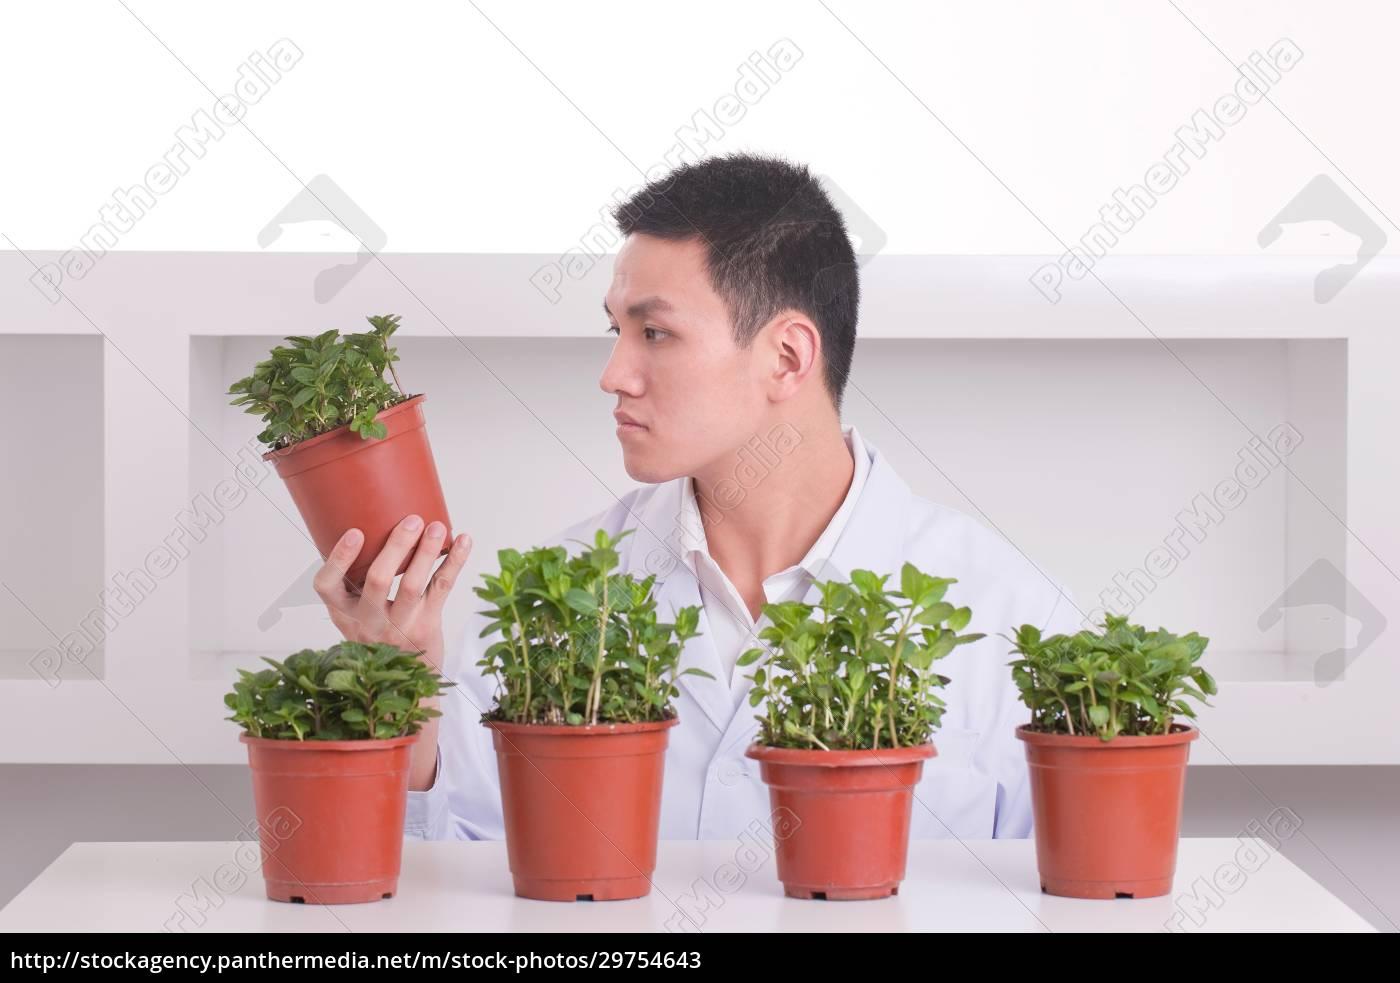 healthy, leisure, tech, medicine, plants, asians - 29754643